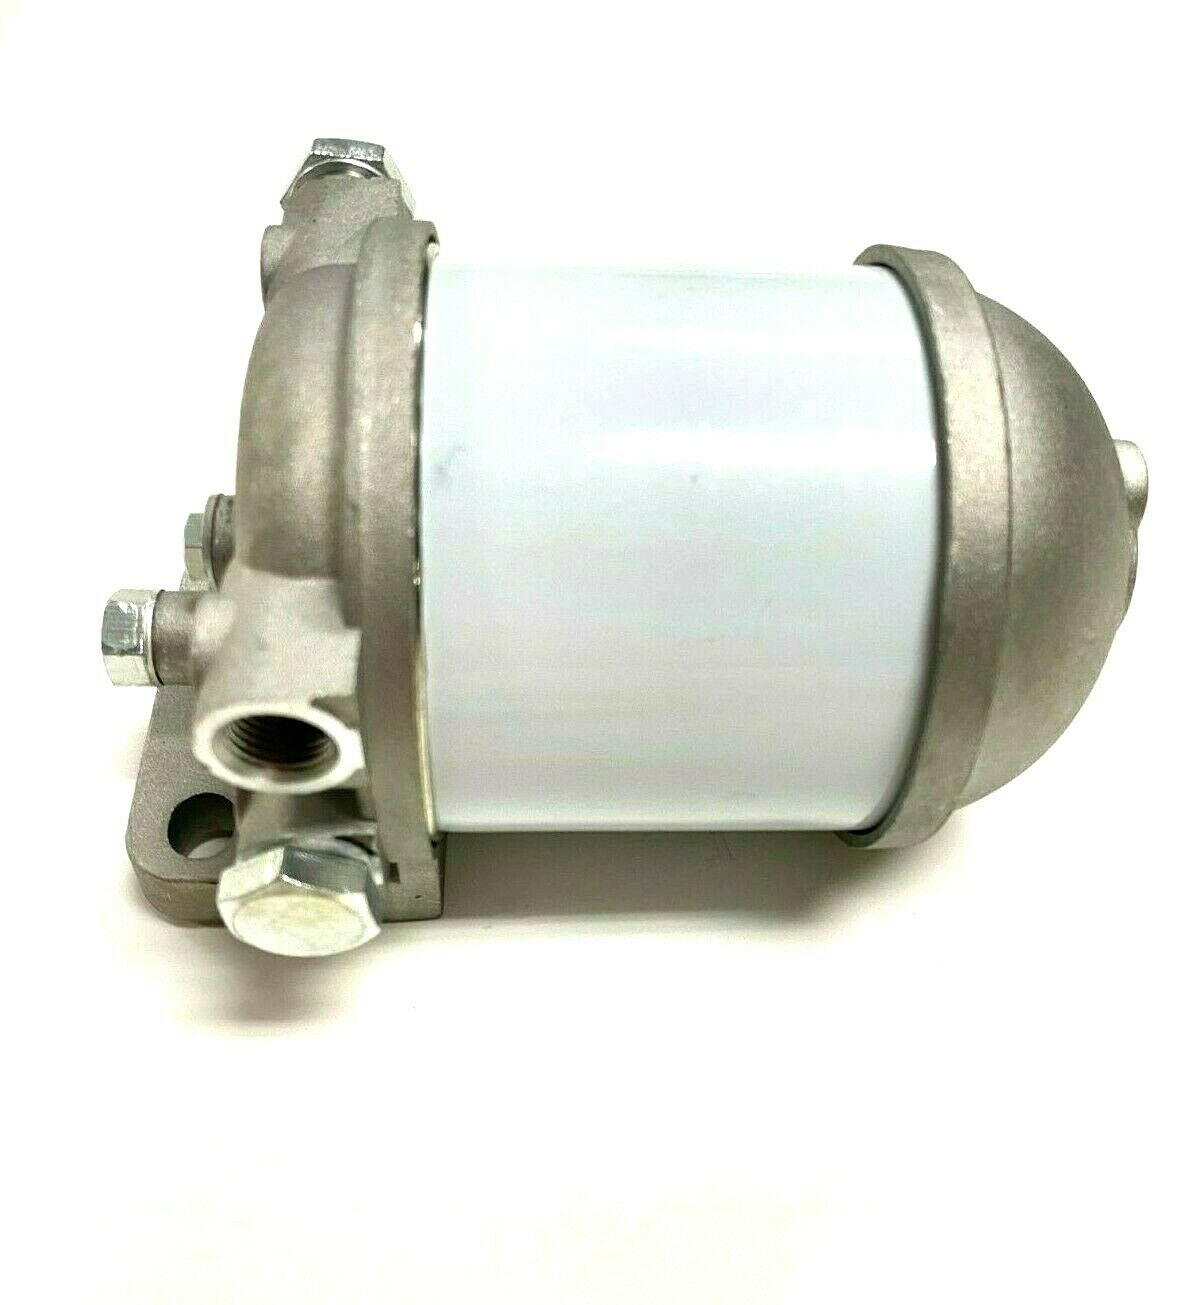 Fuel Filter Glass Bowl Plug Screw Compatible with Lucas CAV Delphi HDF 296 Perkins A4.212 A4.236 Engine